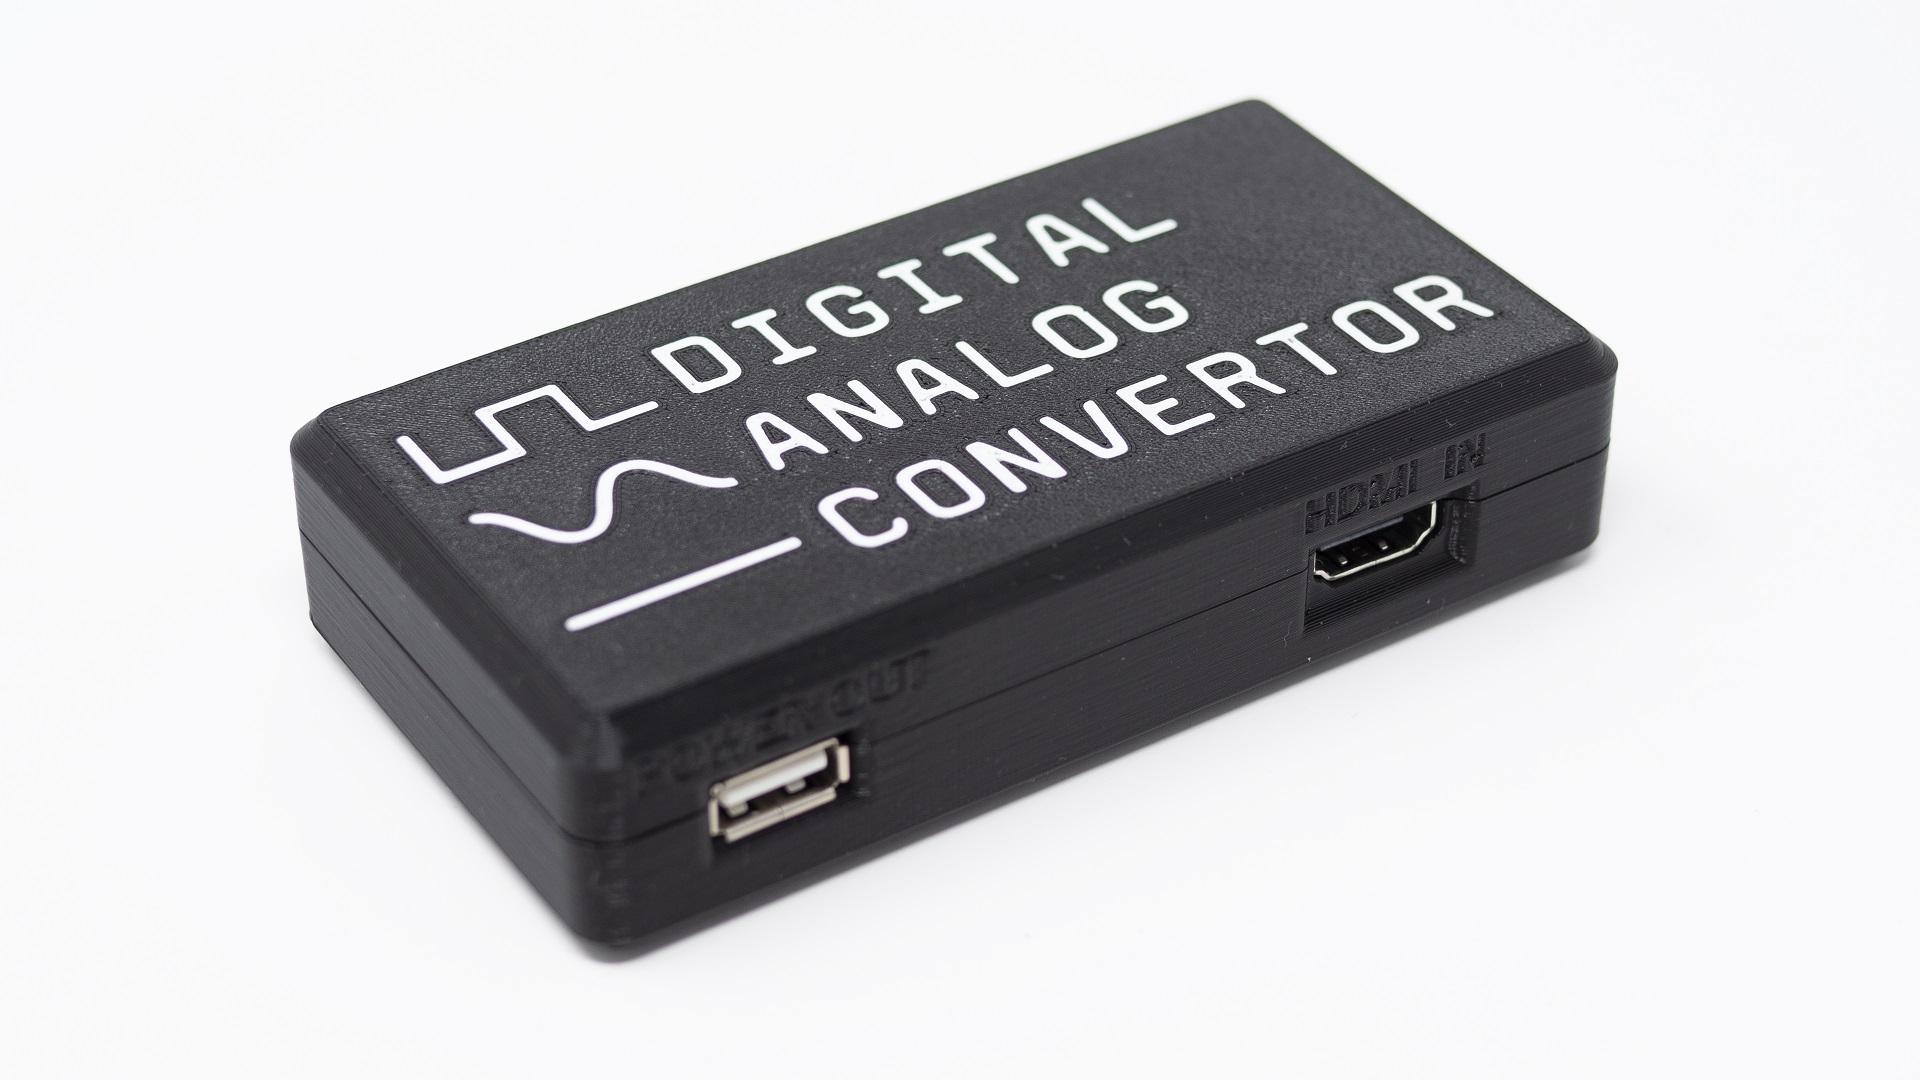 Analogue DAC 3D Printed Case